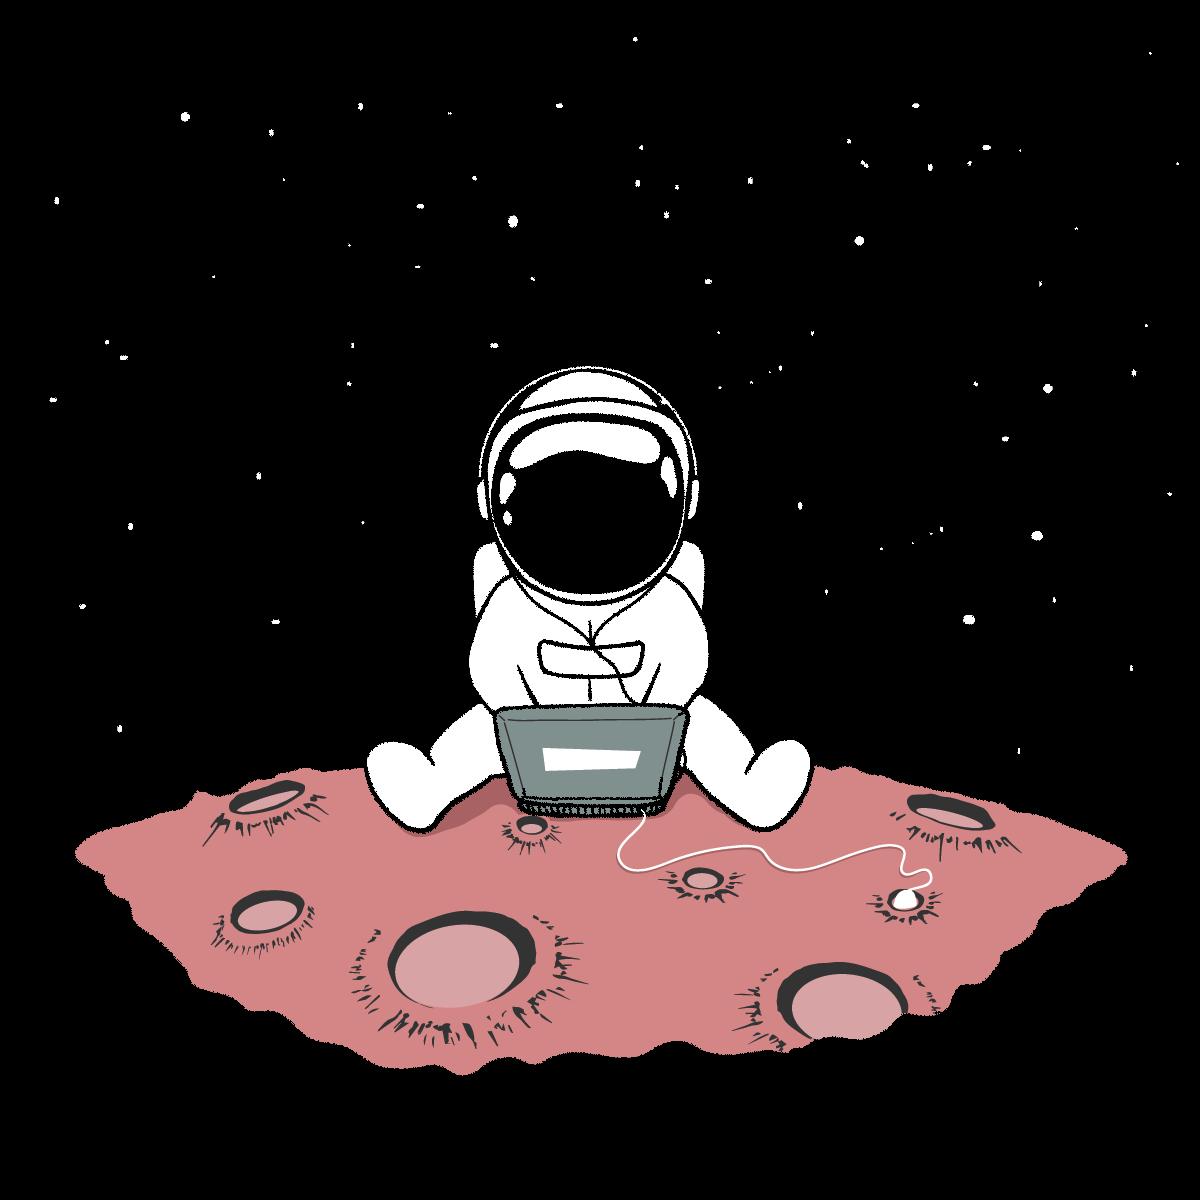 Astronaut using Web App